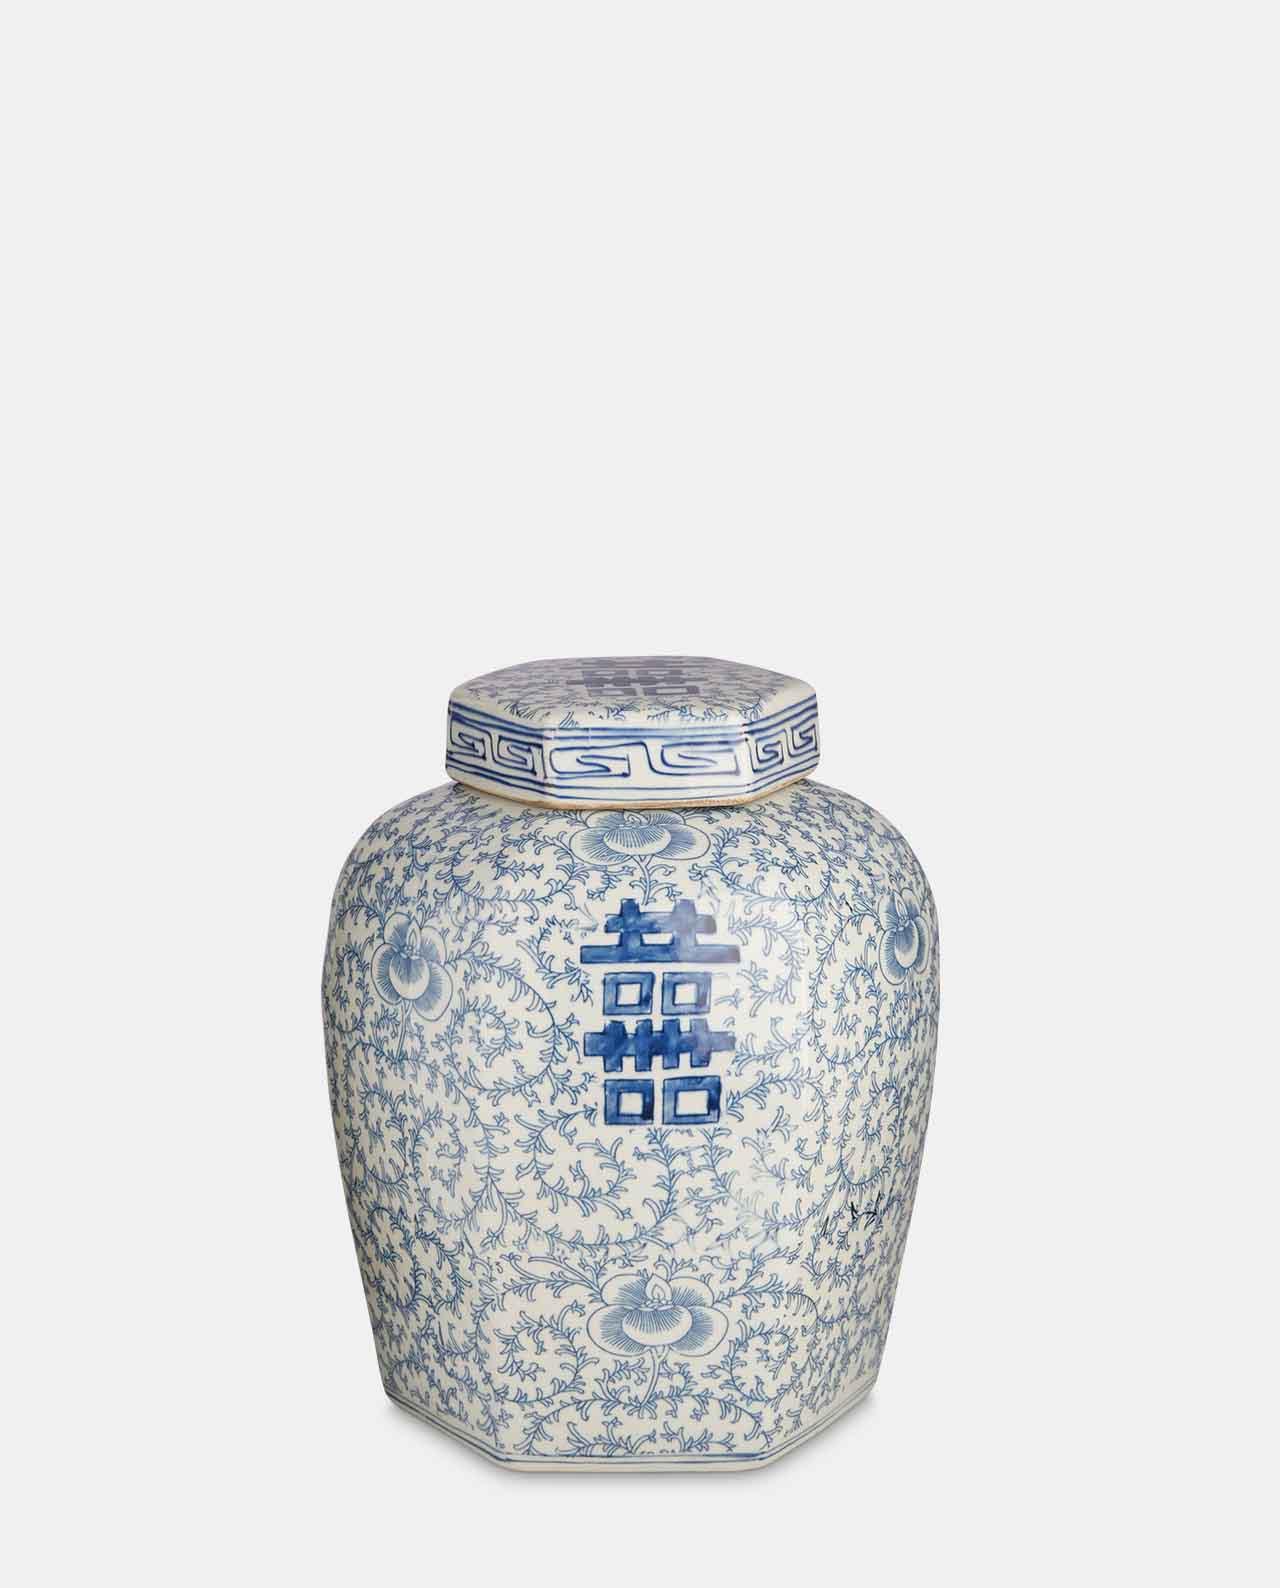 Blue & White Porcelain Jar No 1